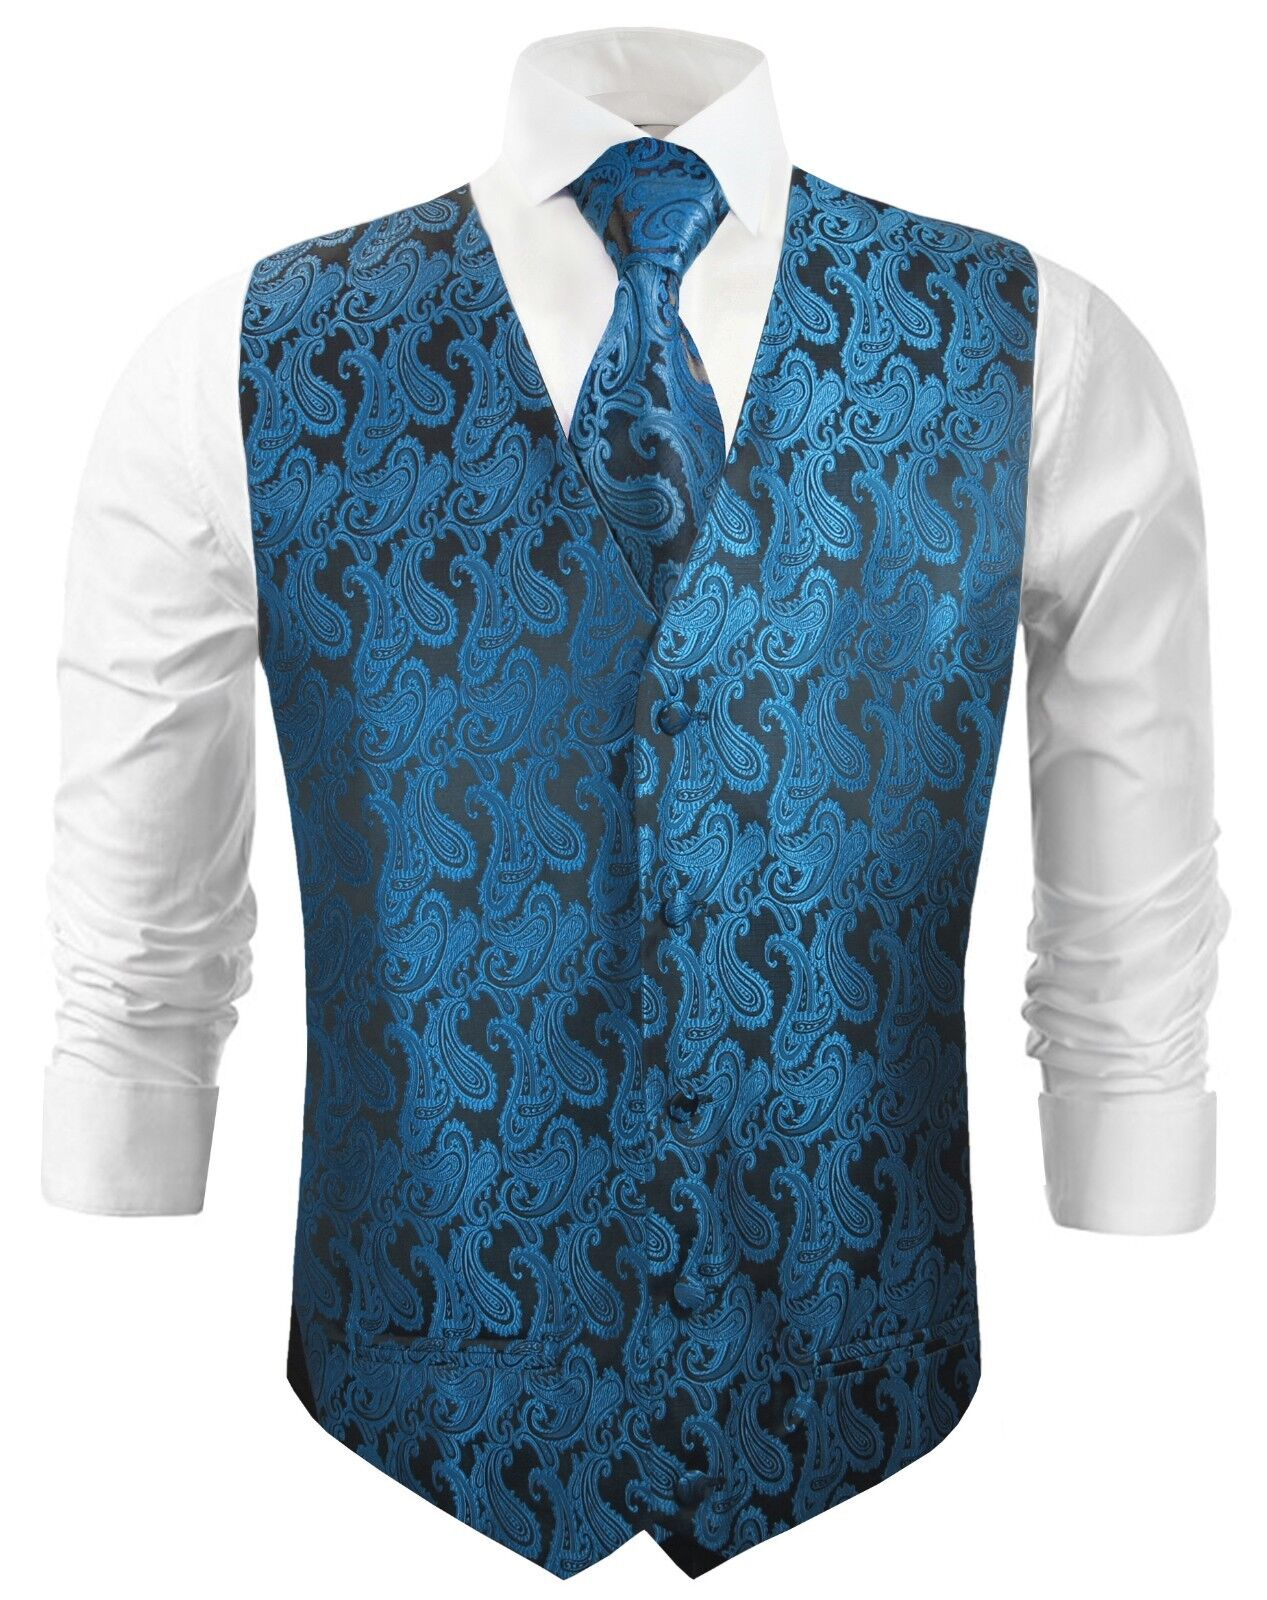 Paul Malone Hochzeitsweste mit Krawatte schwarz petrol paisley v100